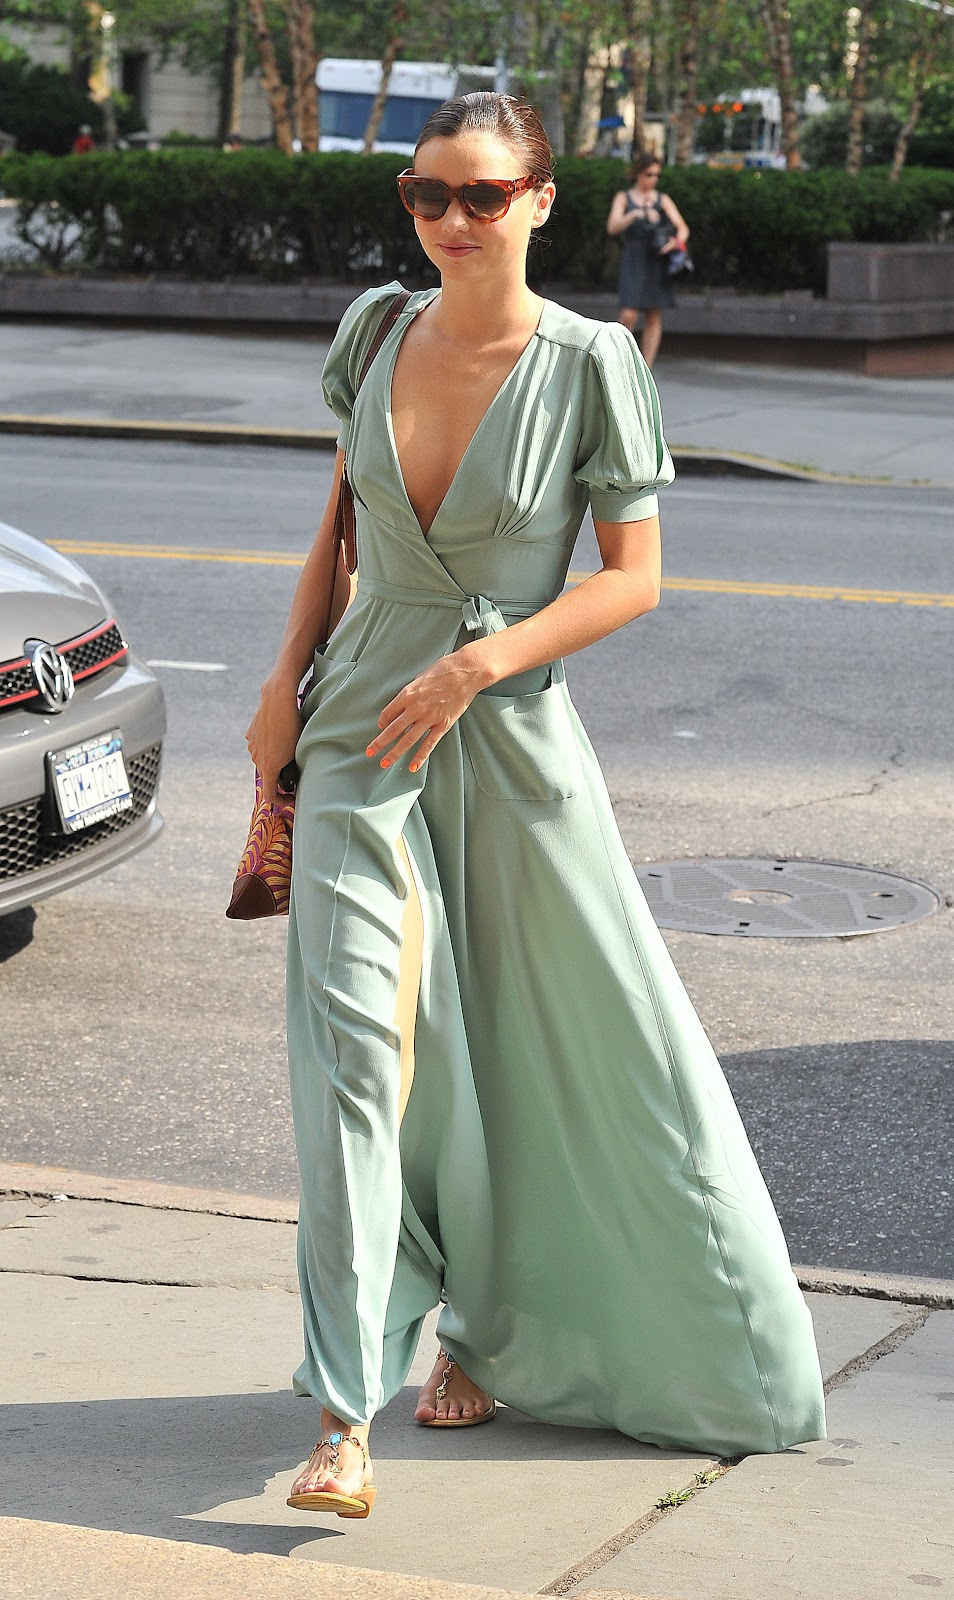 Just Fab Celebs Miranda Kerr Modern Day Aphrodite Out